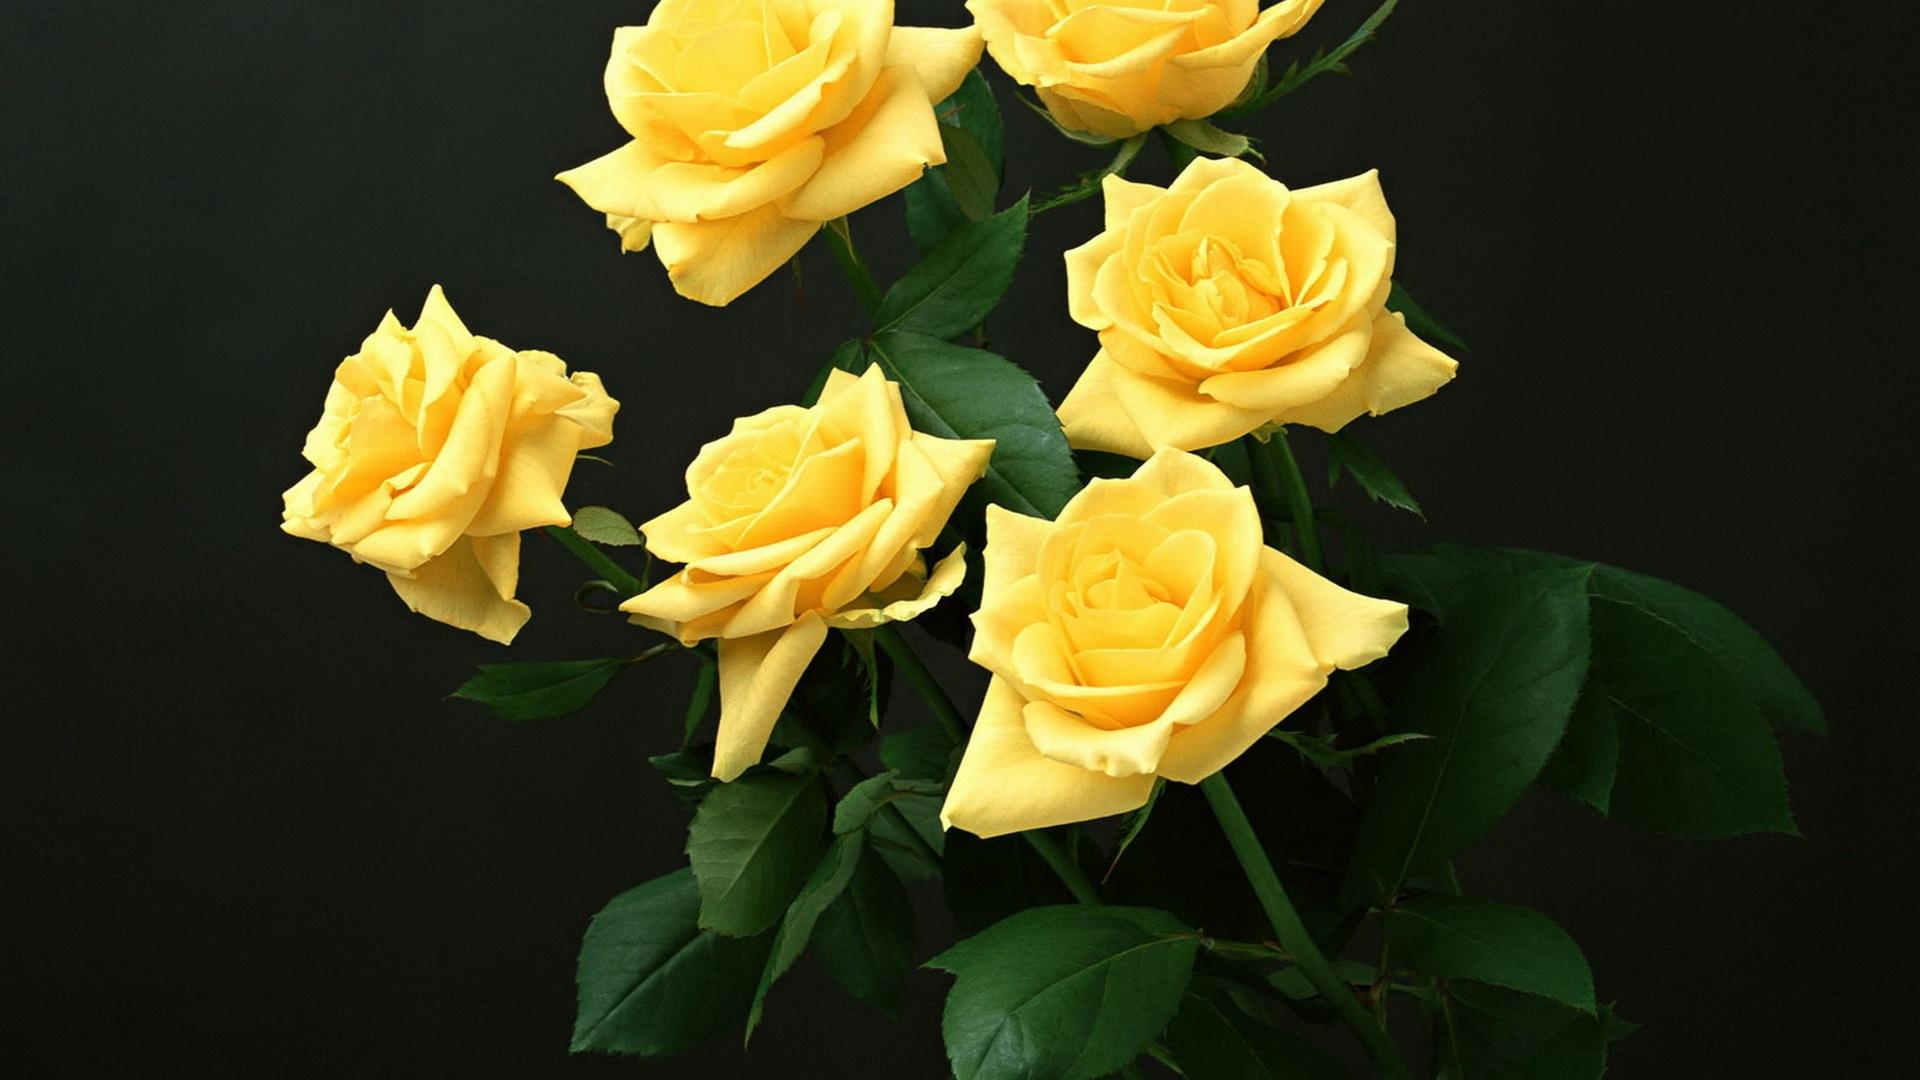 yellow rose wallpaper download